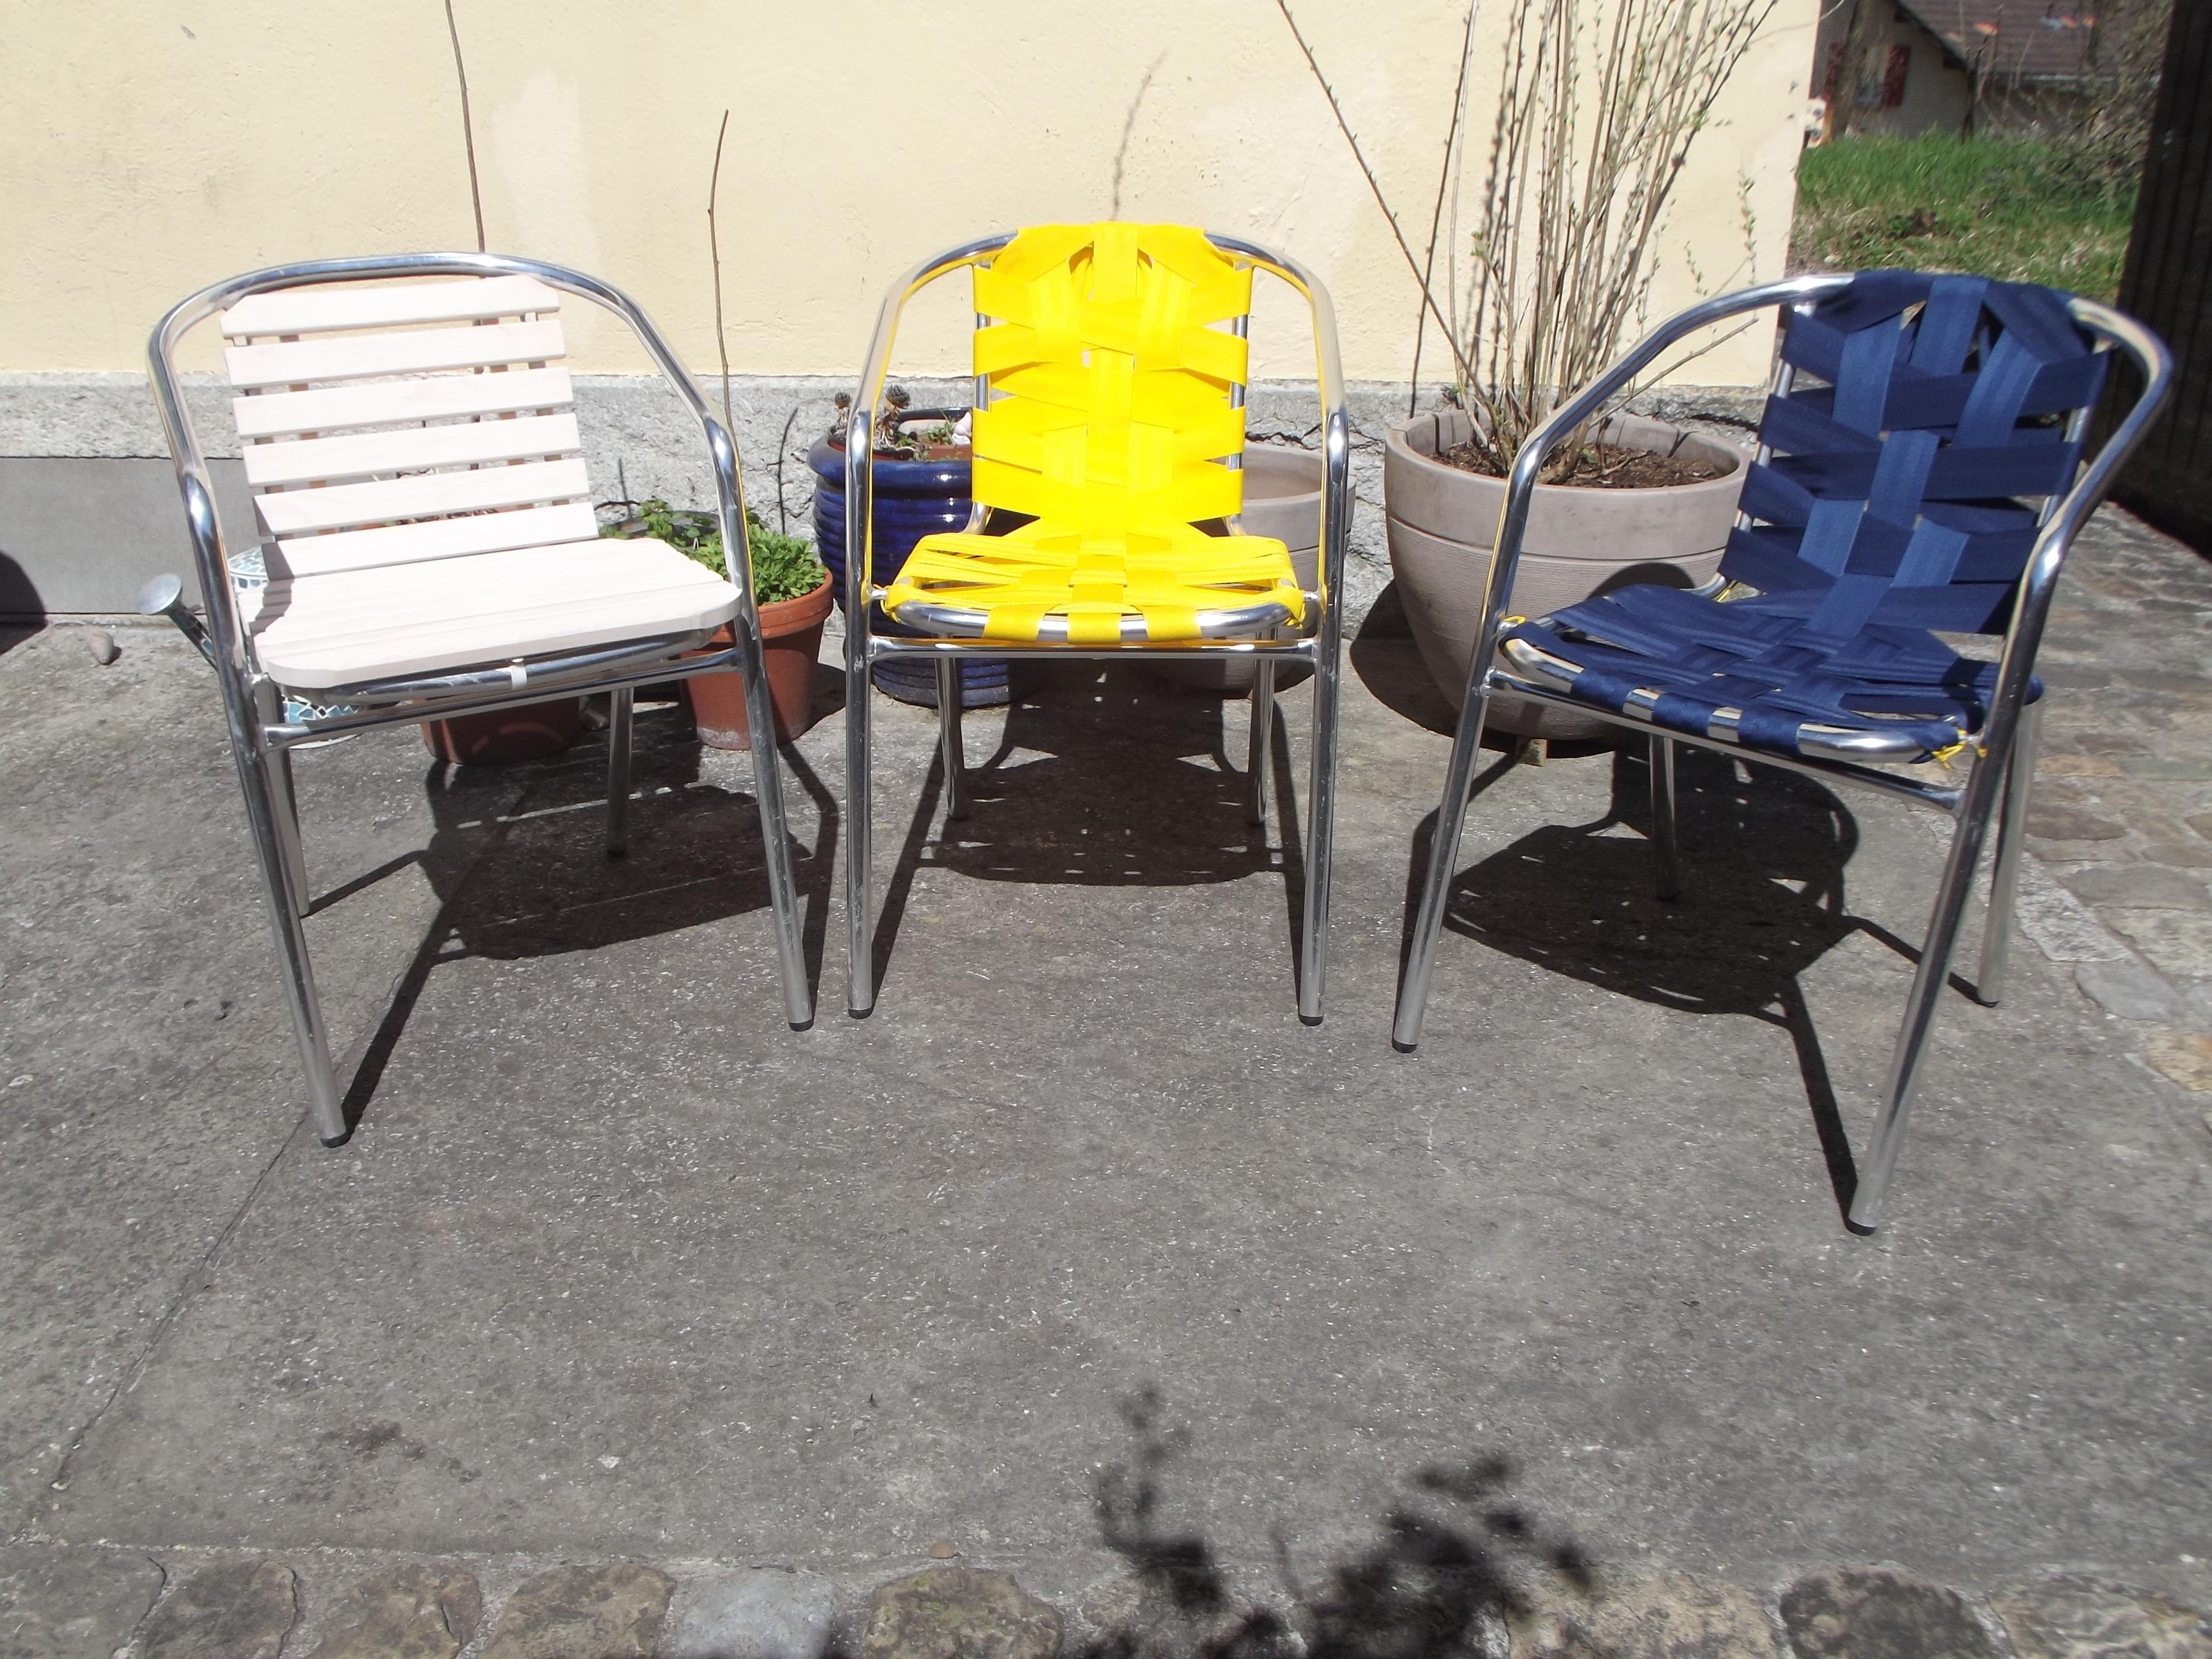 Refurbish your old garden chairs